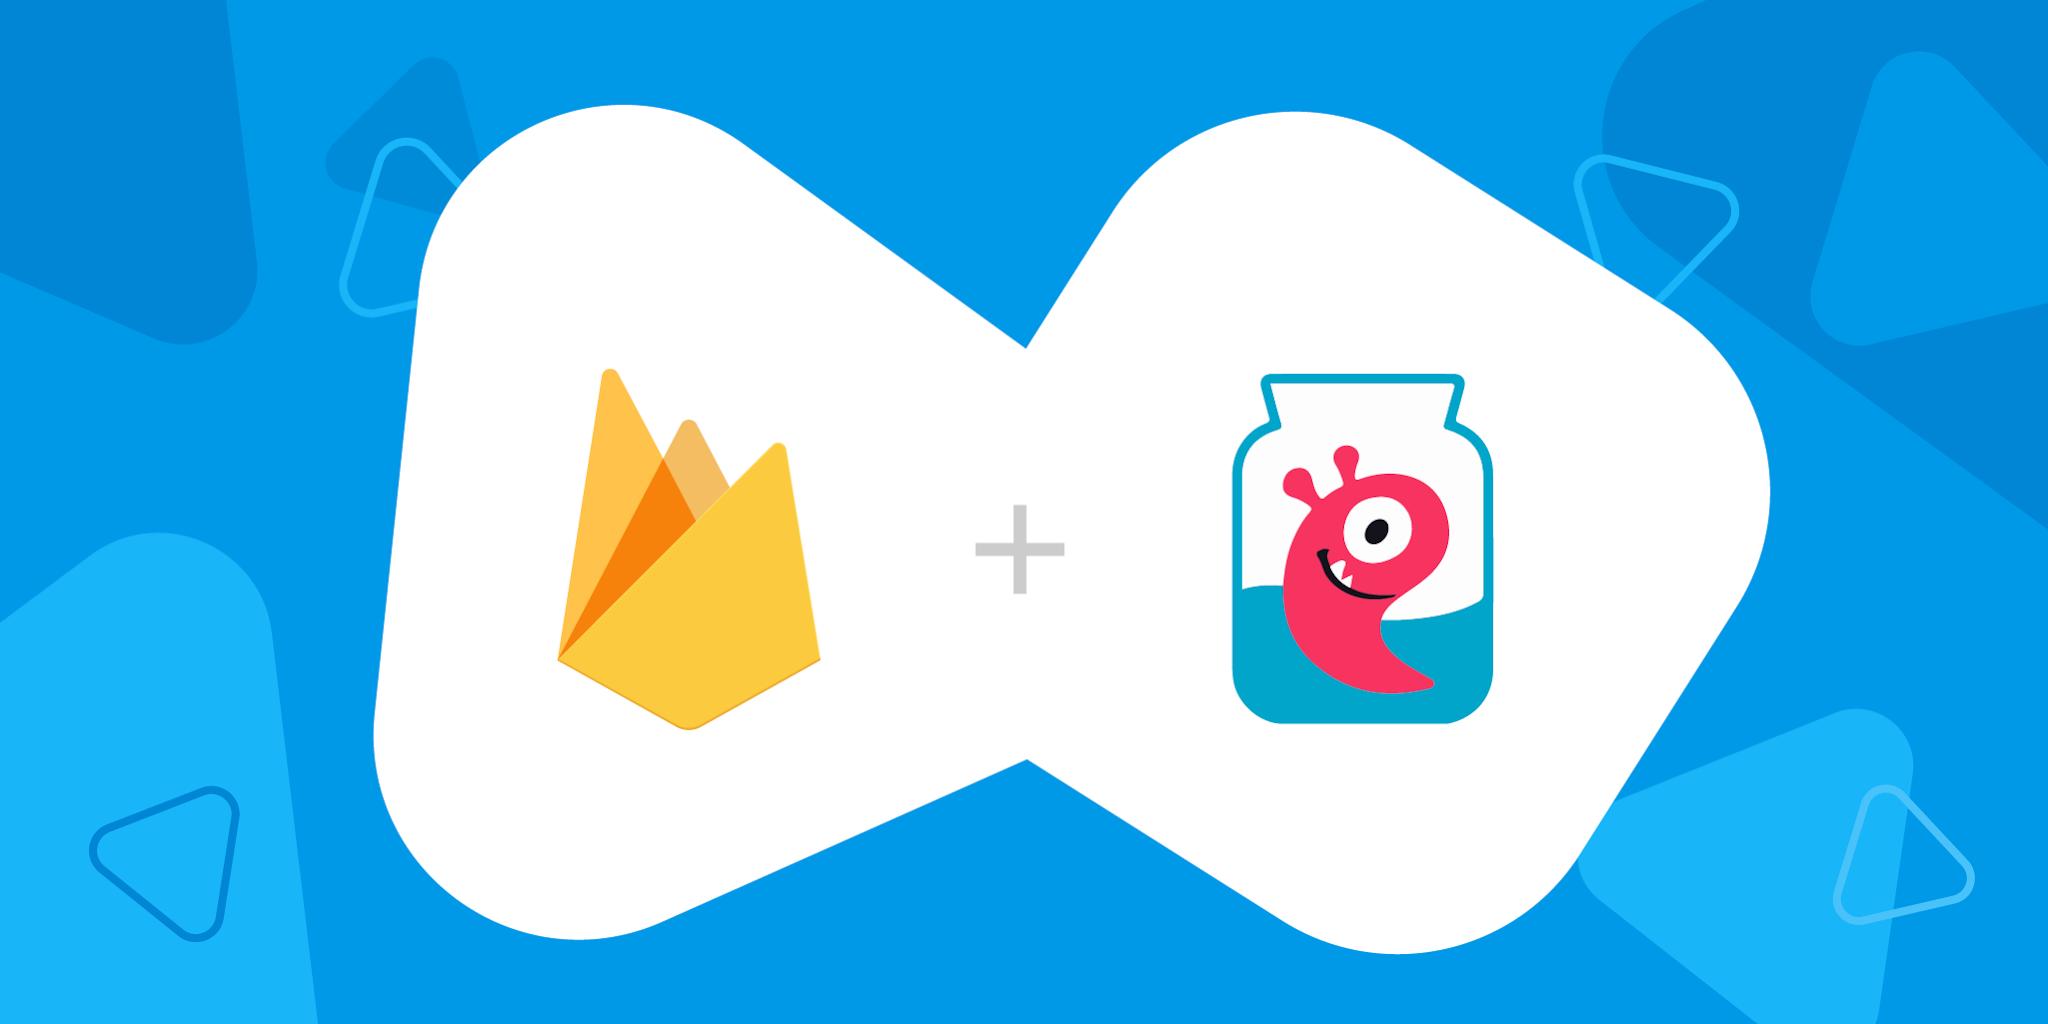 image of Firebase logo and CrazyLabs logo